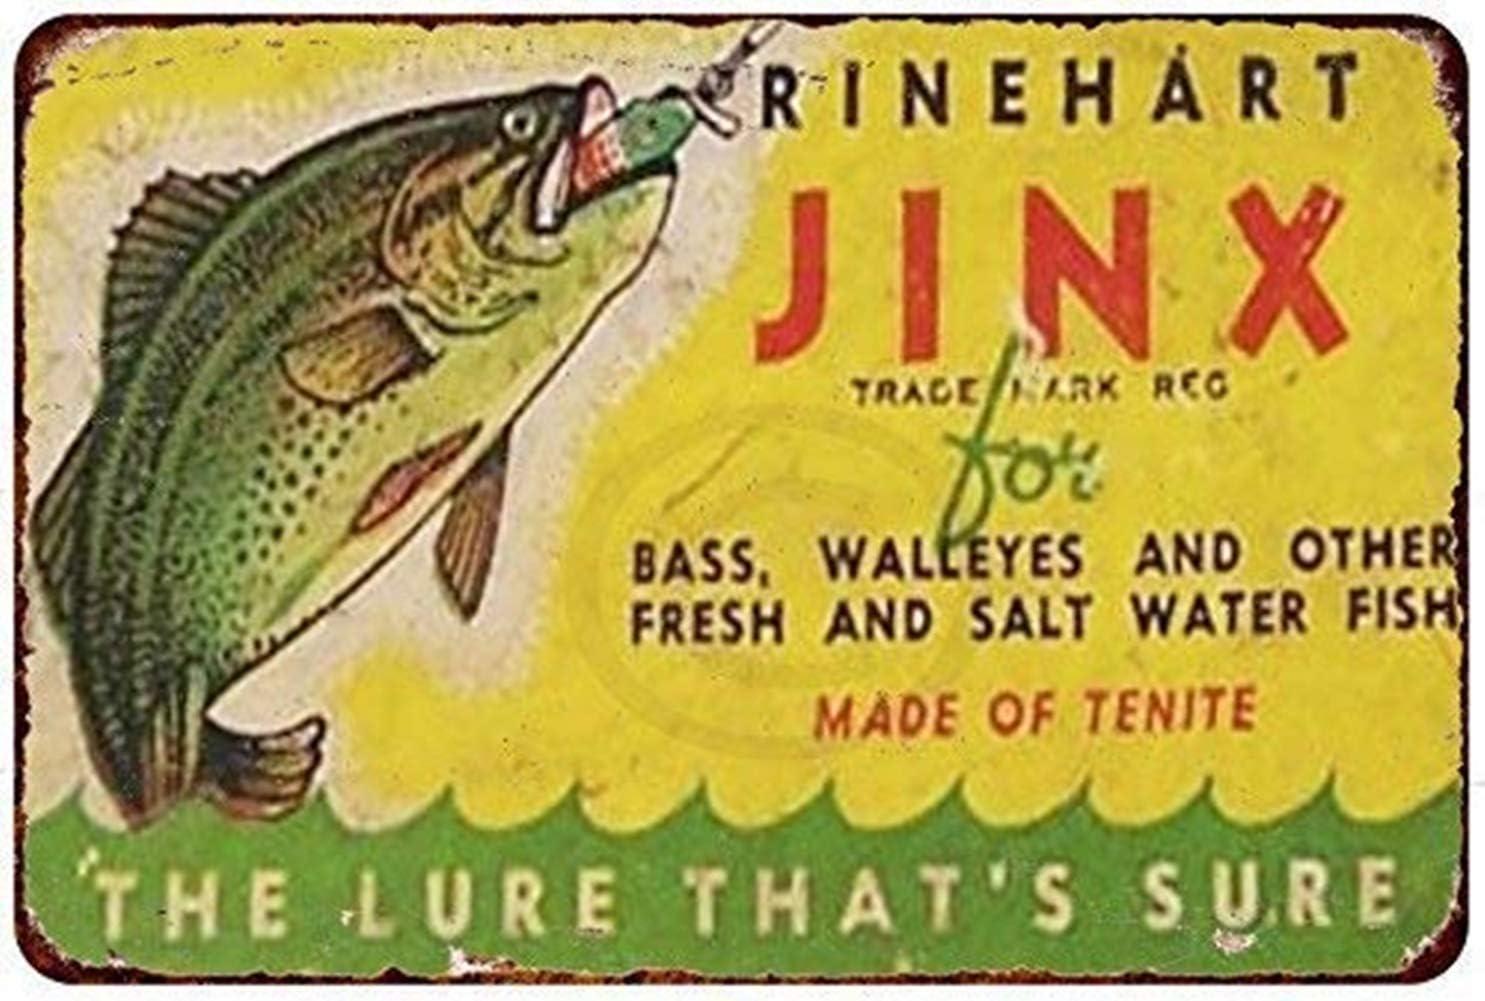 MAIYUAN Wall Decor Sign Rinehart Jinx Fishing Lure Rustic Vintage Look Aluminum Metal Sign 8x12 Inches (BBM4016)